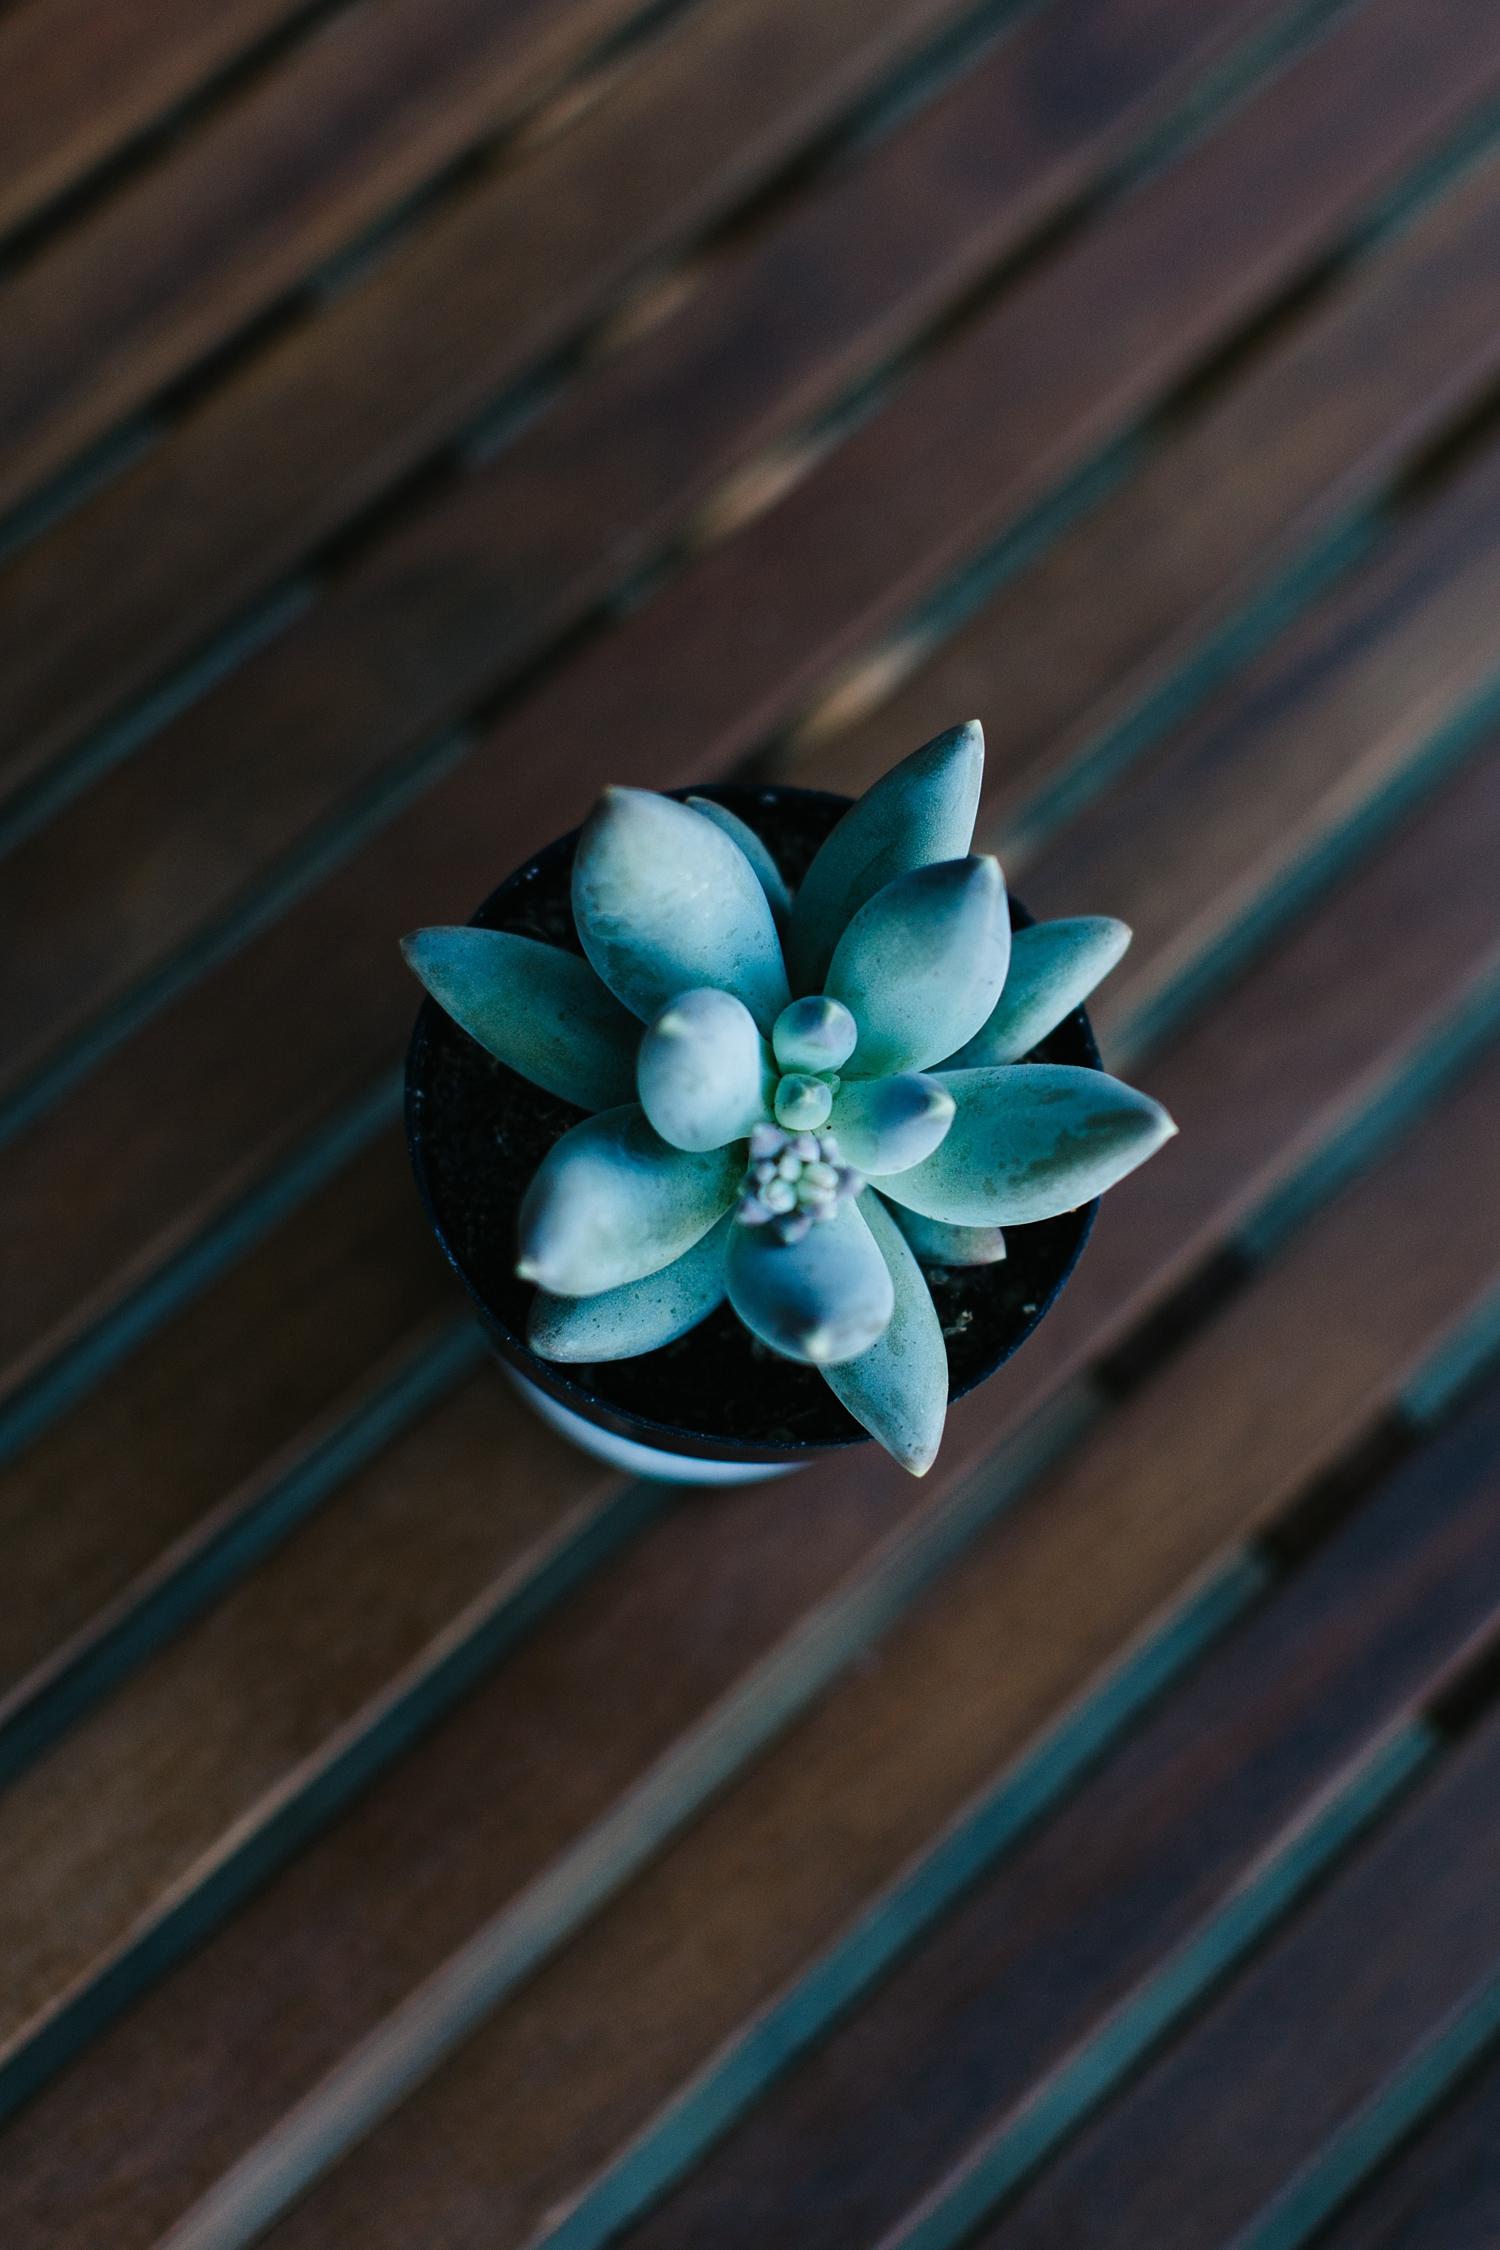 Pachyphytum bracteosum with plump blue succulent leaves.